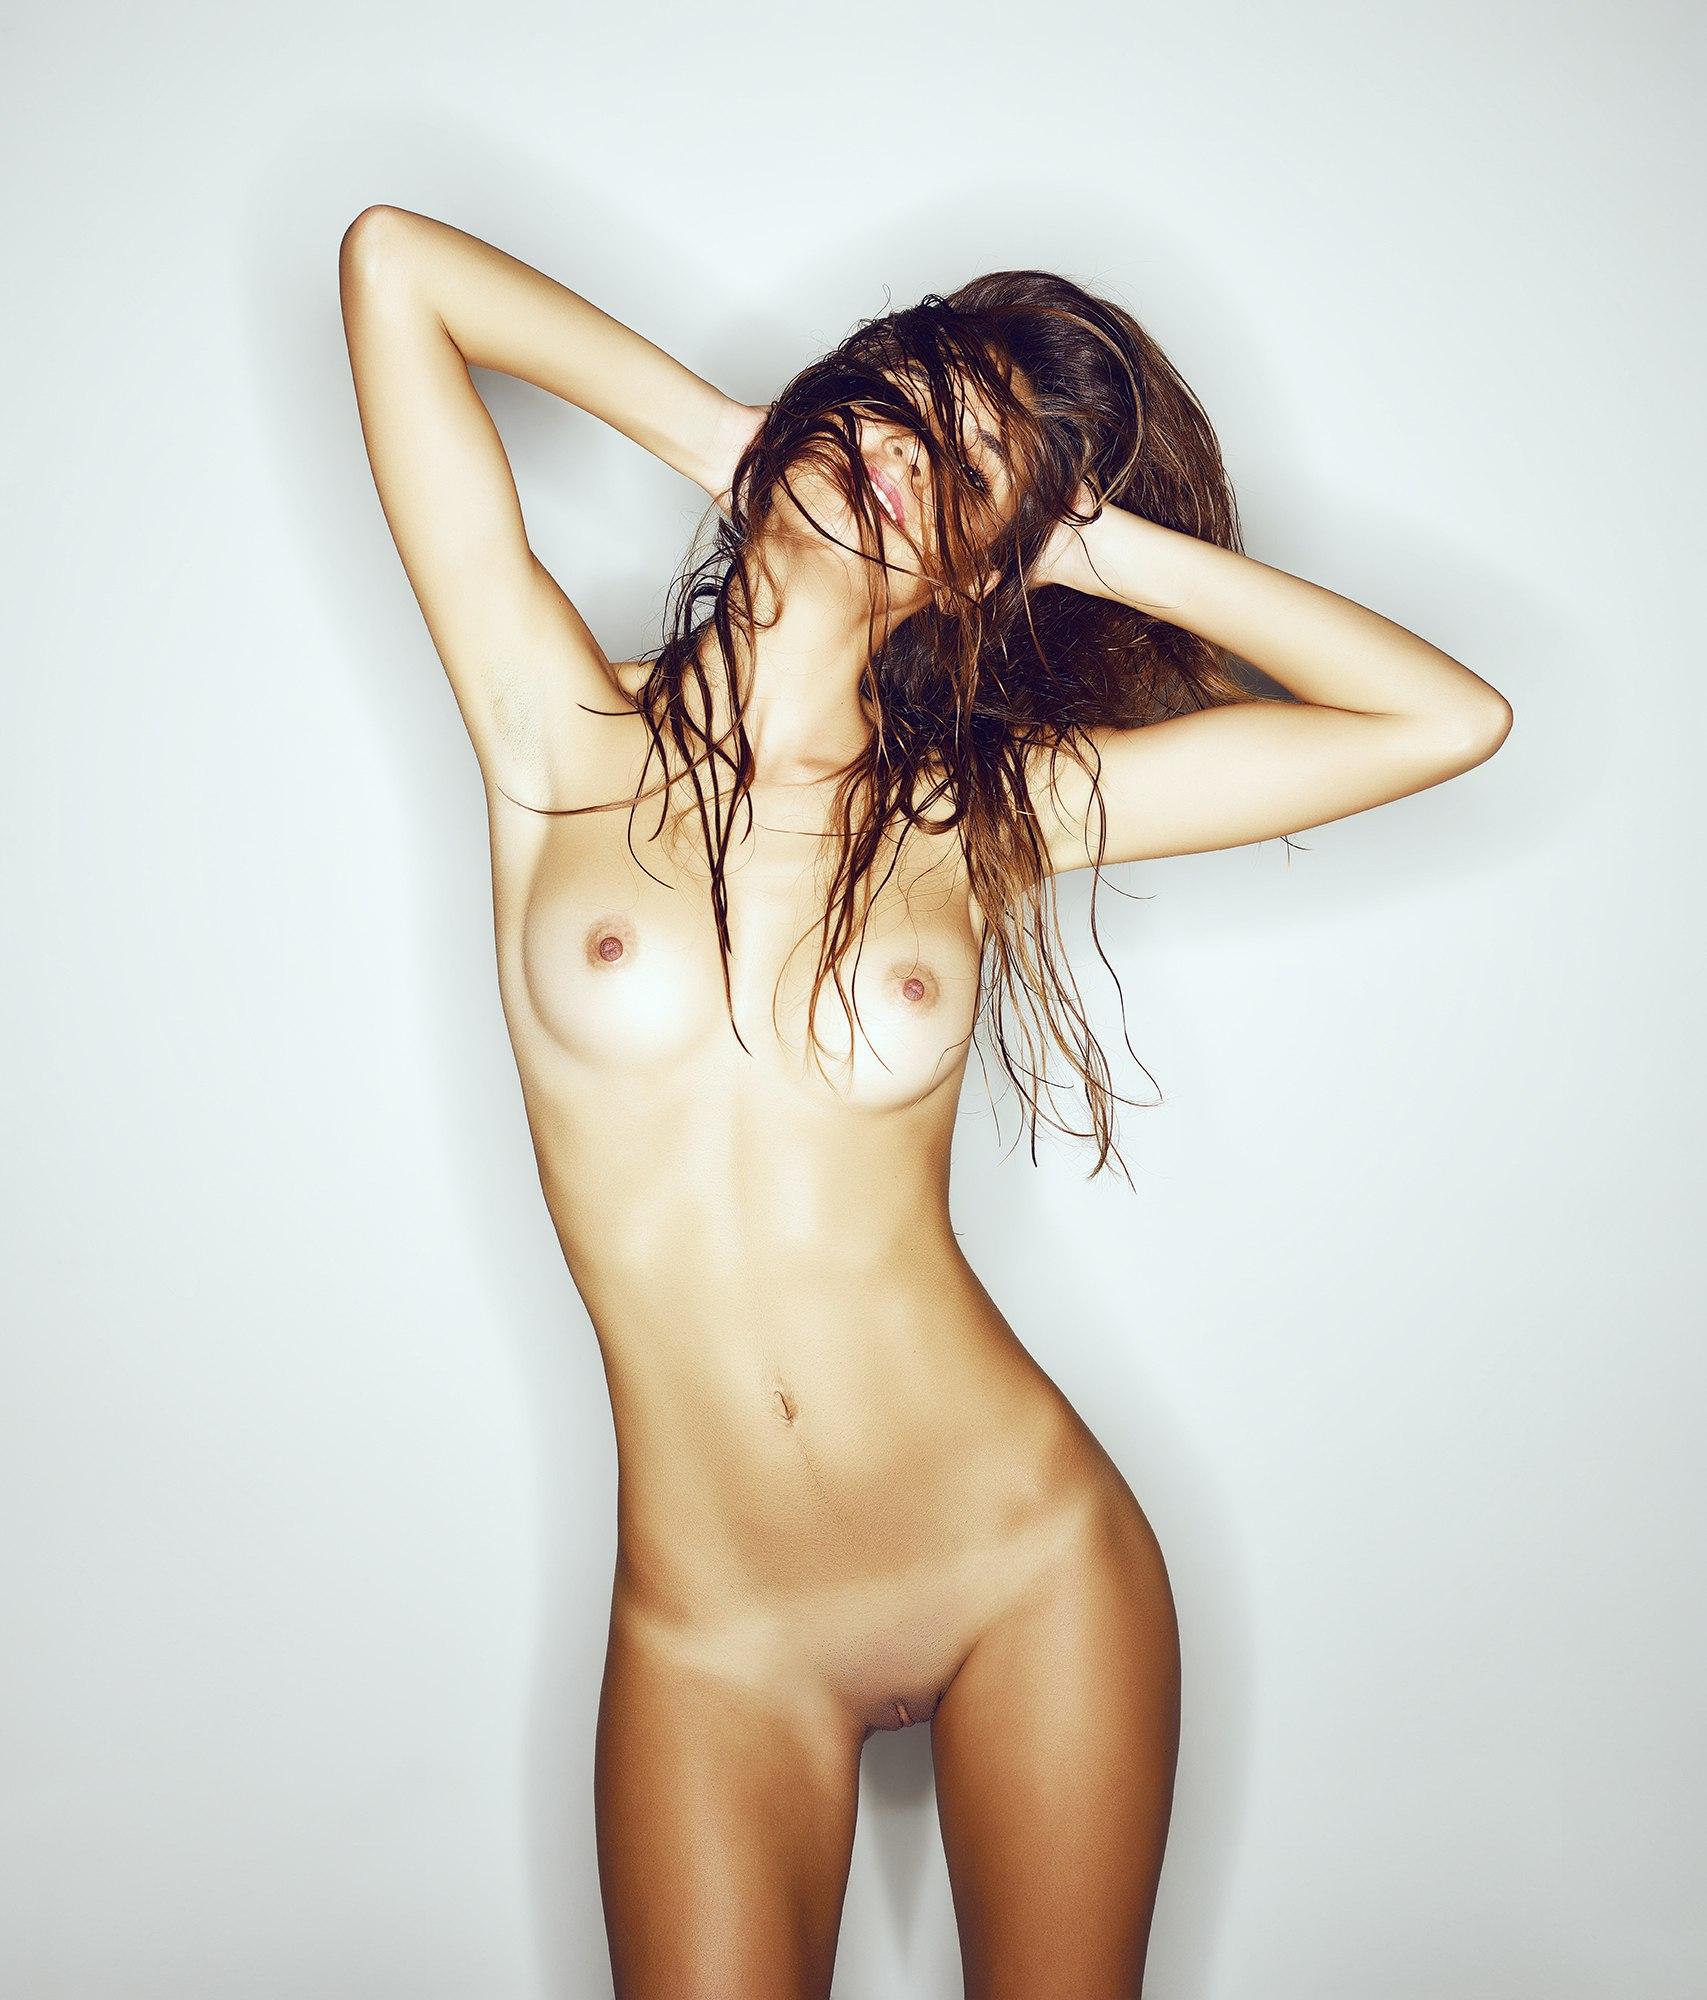 Victoria Rain - E. Jinkoff photoshoot